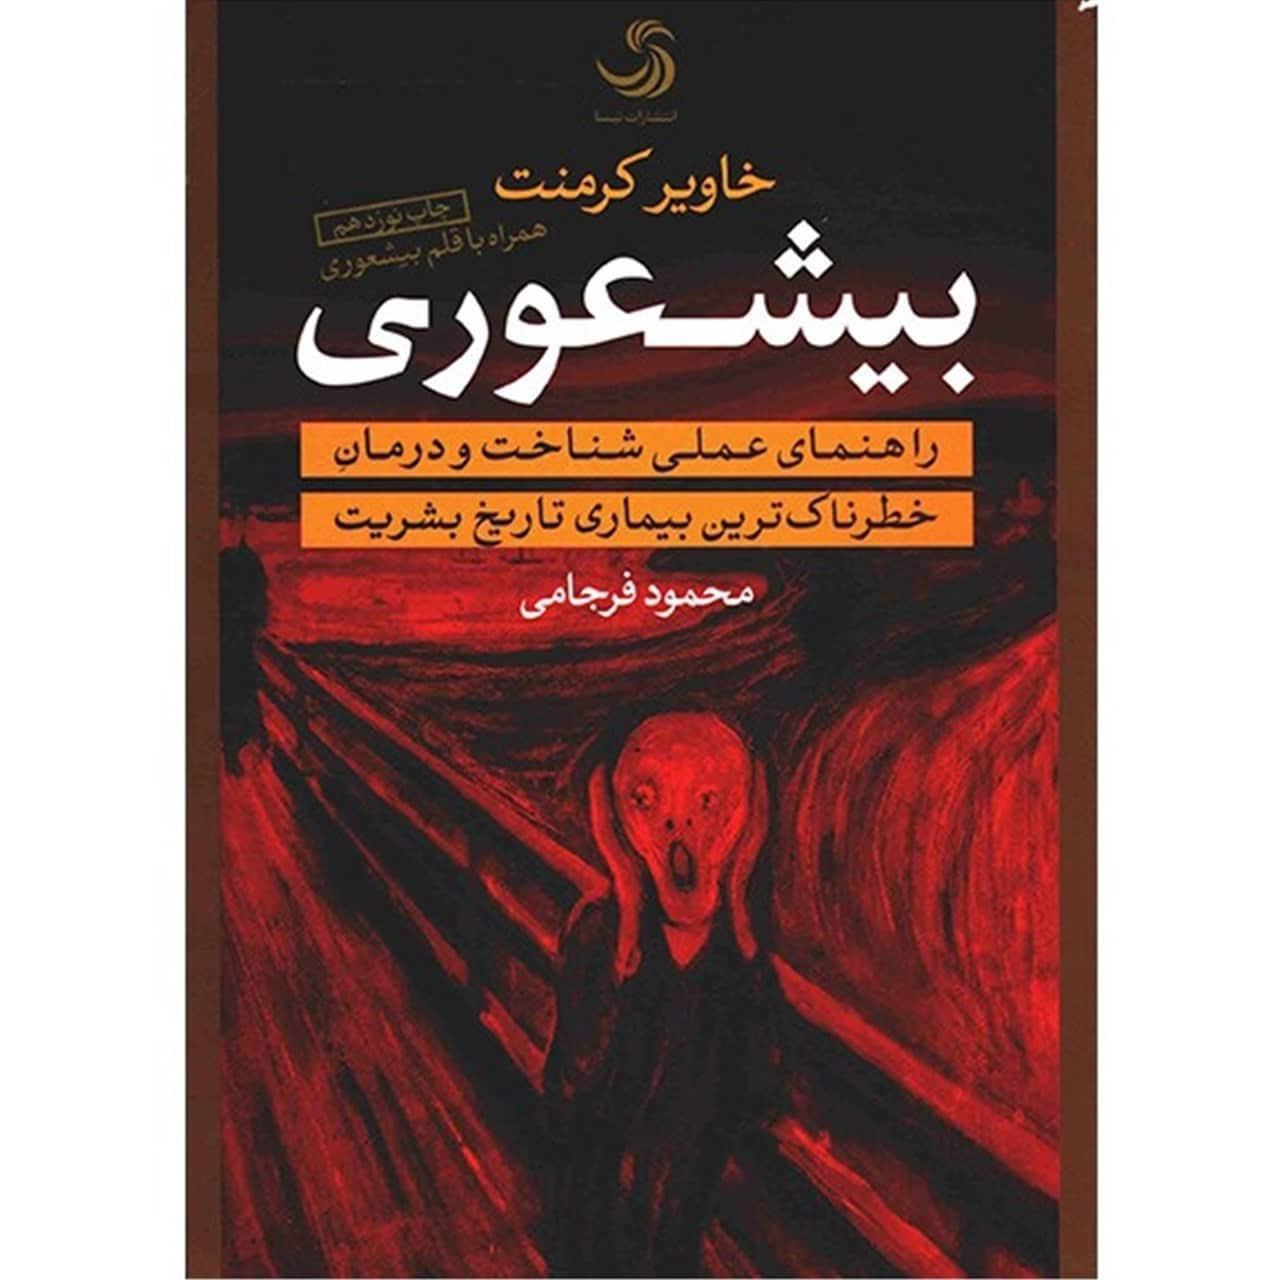 Book-Bishori4b6c48